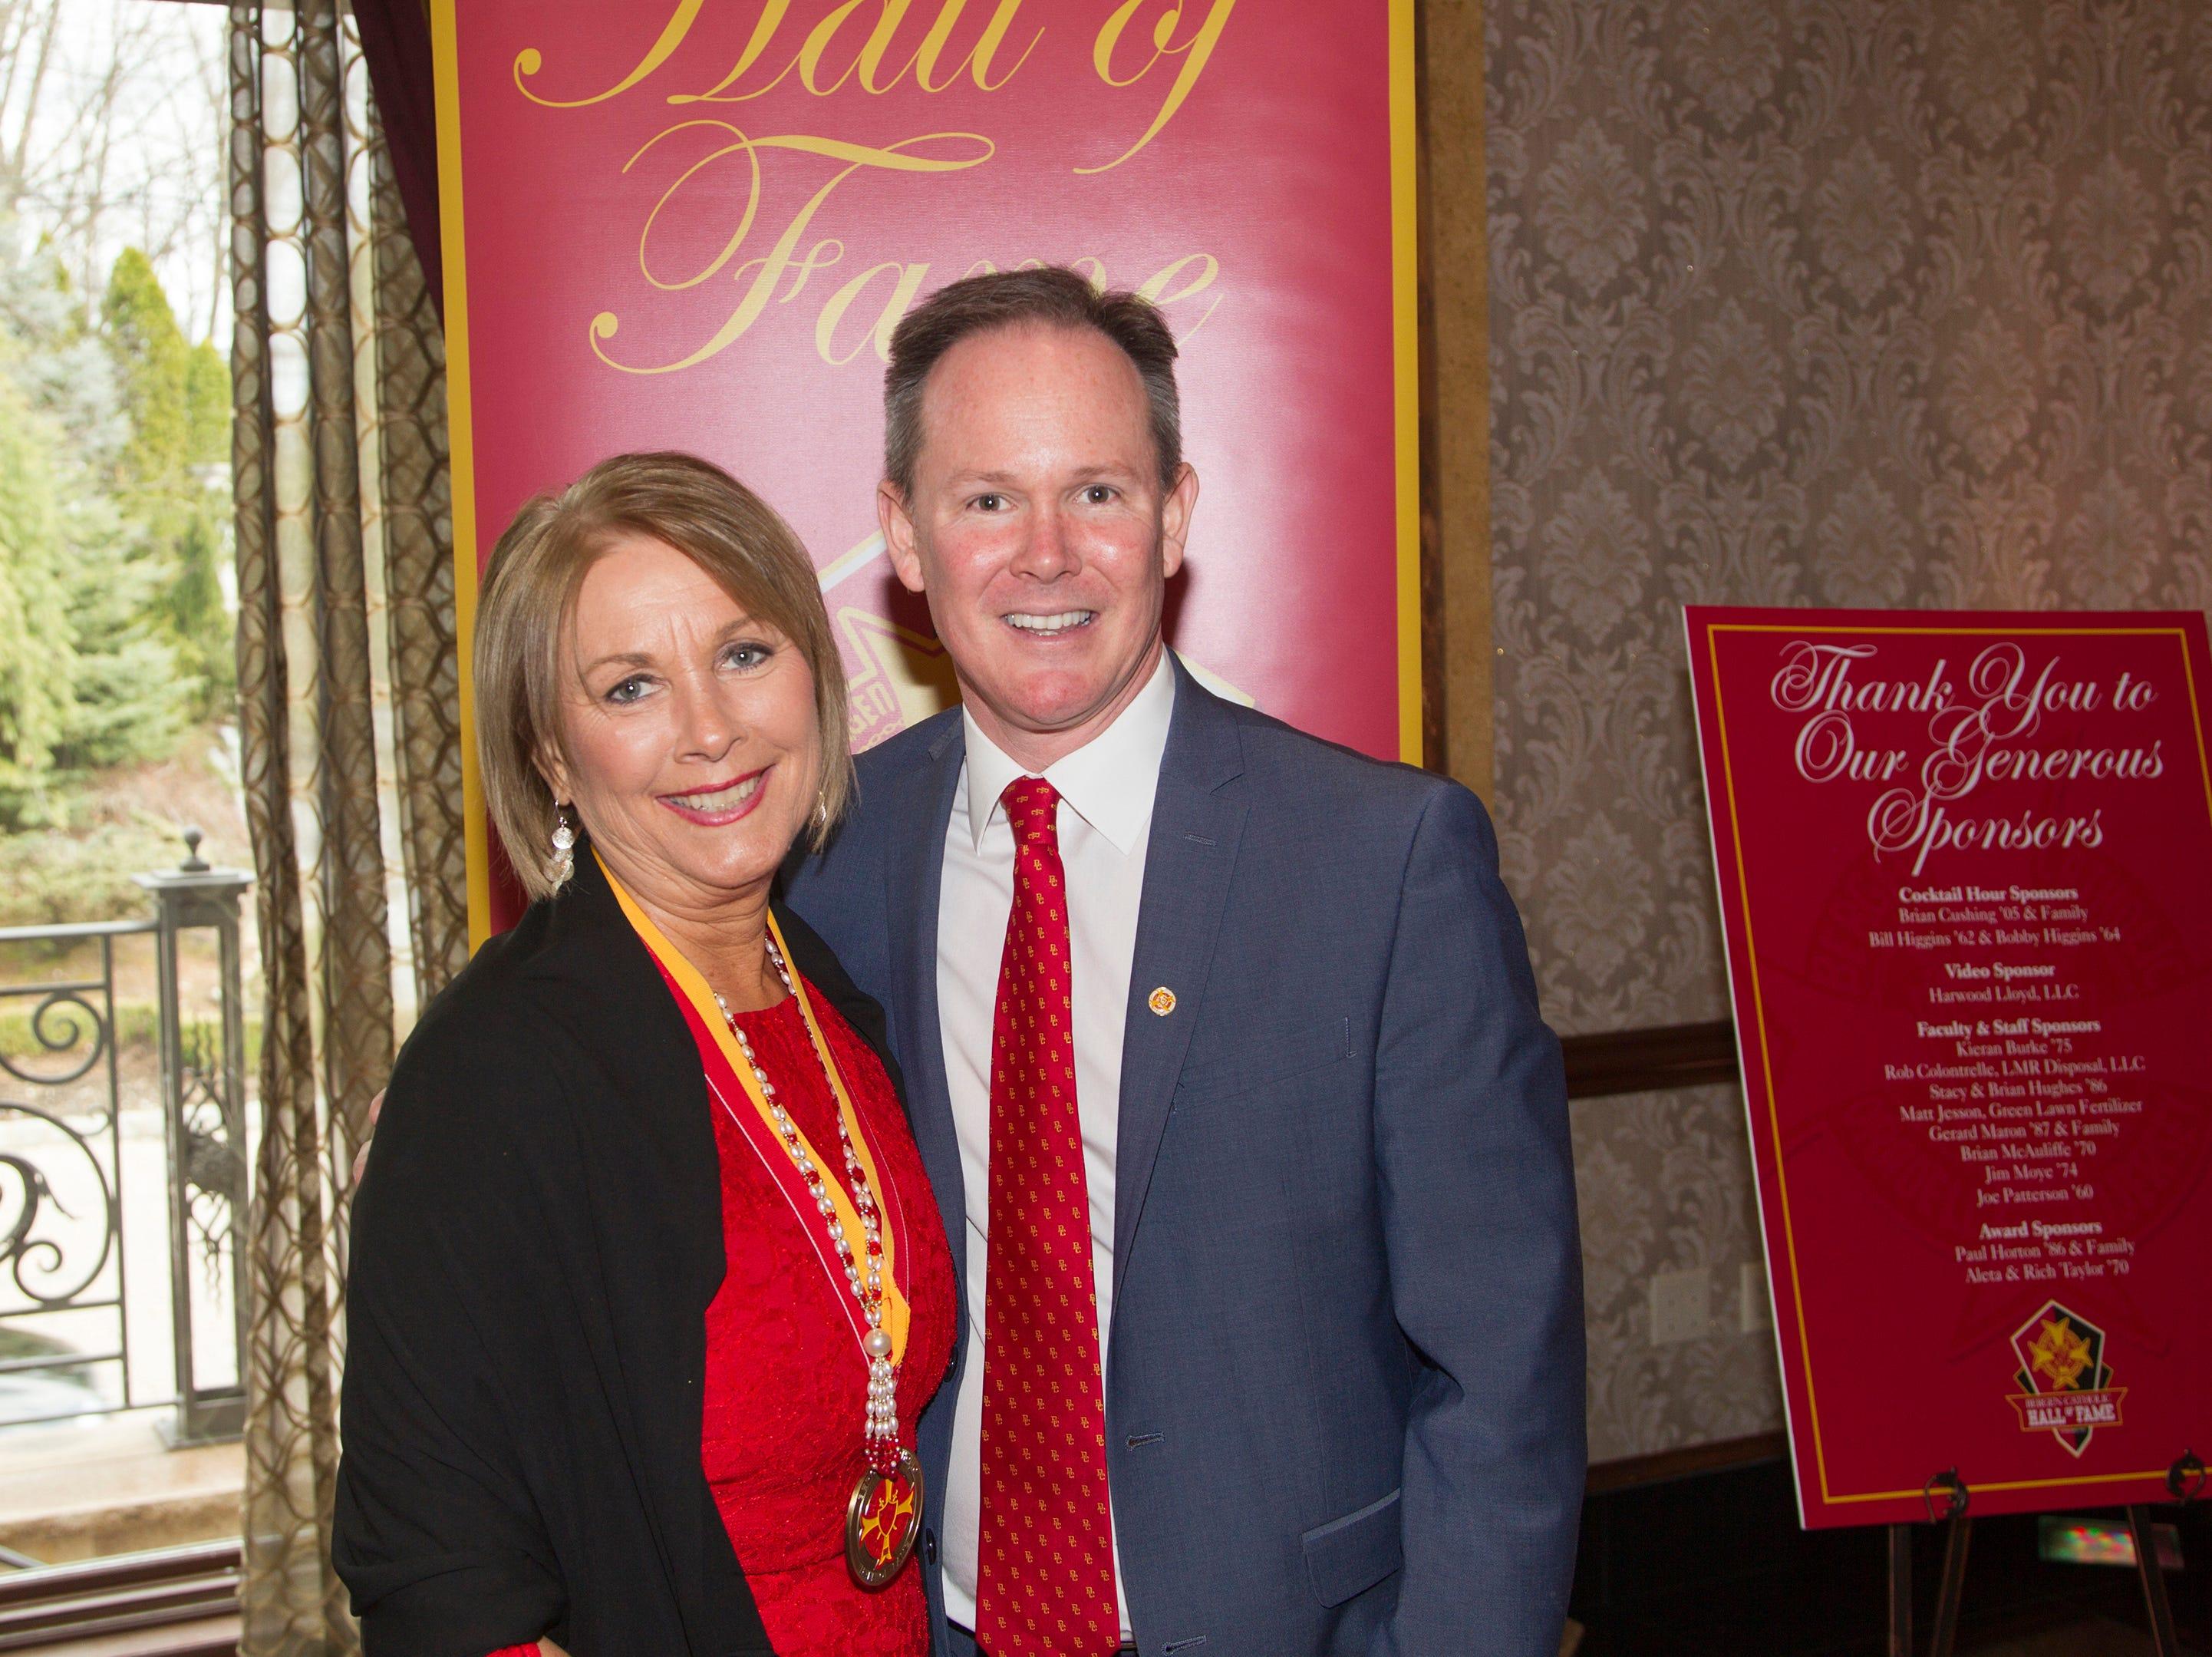 Marge Quinn, President  Dr. Brian Mahoney. Bergen Catholic High School Hall of Fame Dinner at Seasons in Washington Twp. 03/31/2019